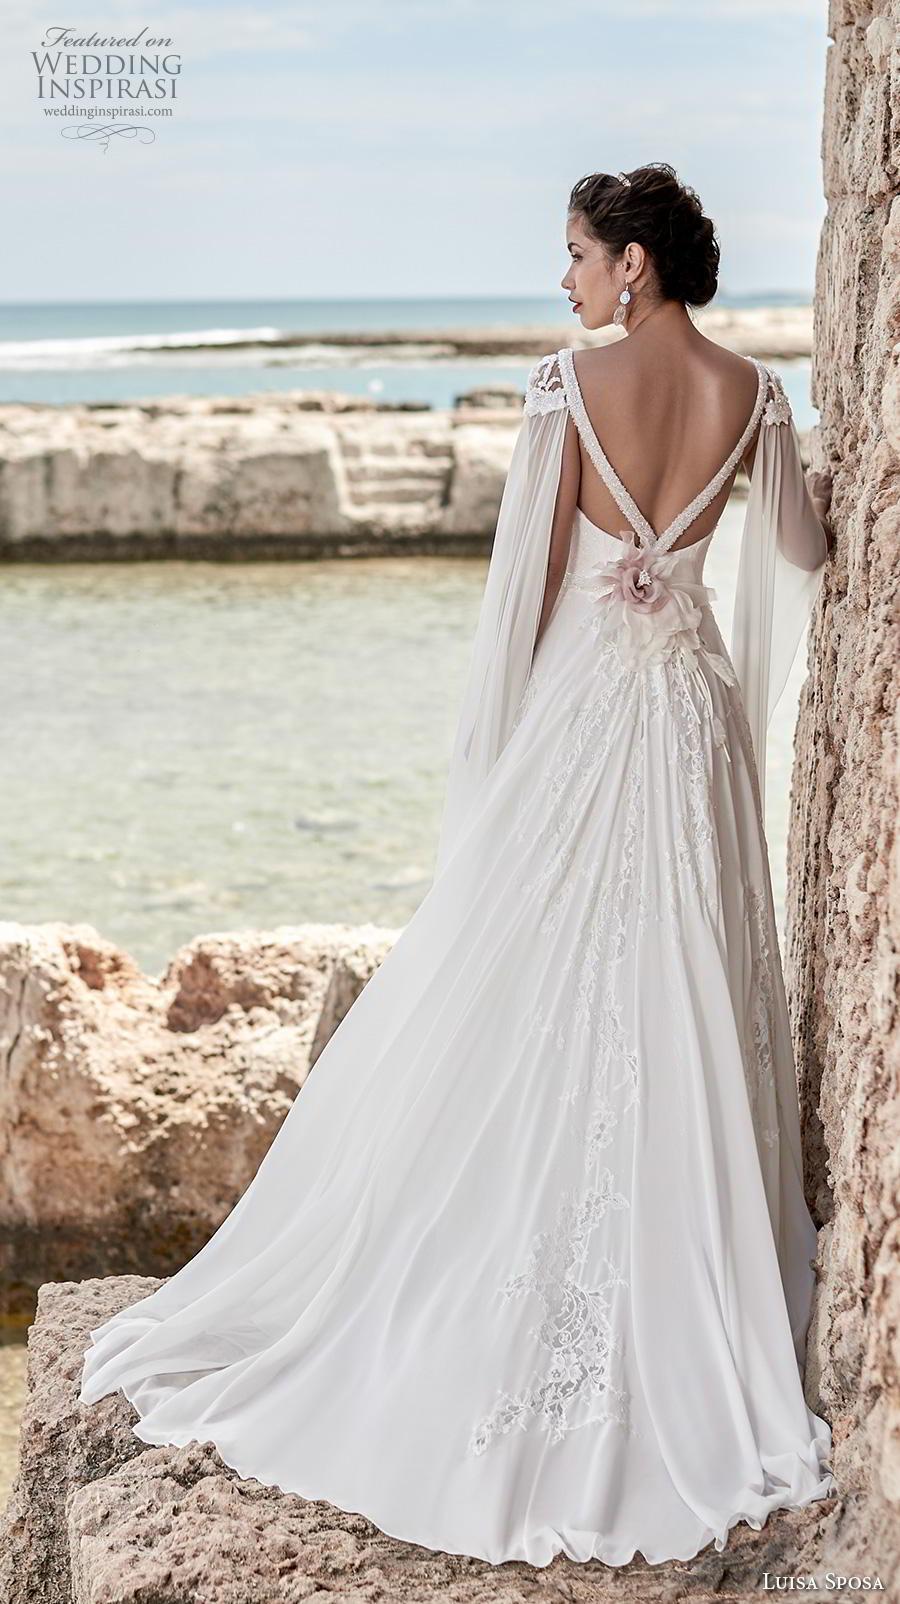 luisa sposa 2020 bridal cap sleeves floor length hanging sleeves deep plunging v neck heavily embellished bodice goddess grecian a  line wedding dress backless sweep train (20) bv